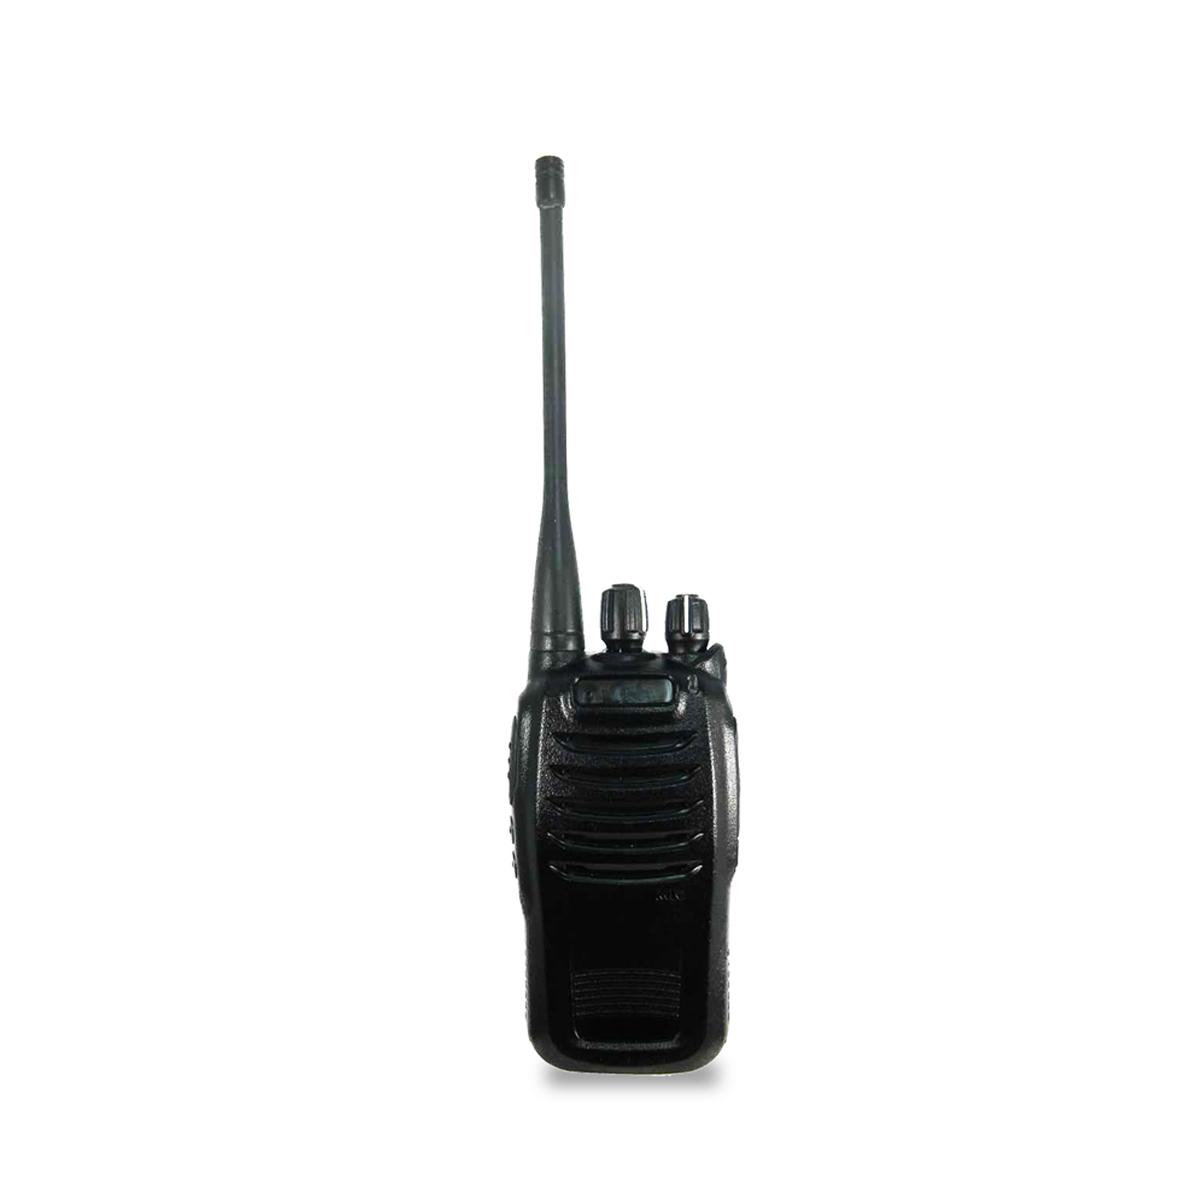 Radio Genérico TH-2800 Analógico VHF 136-174 MHz